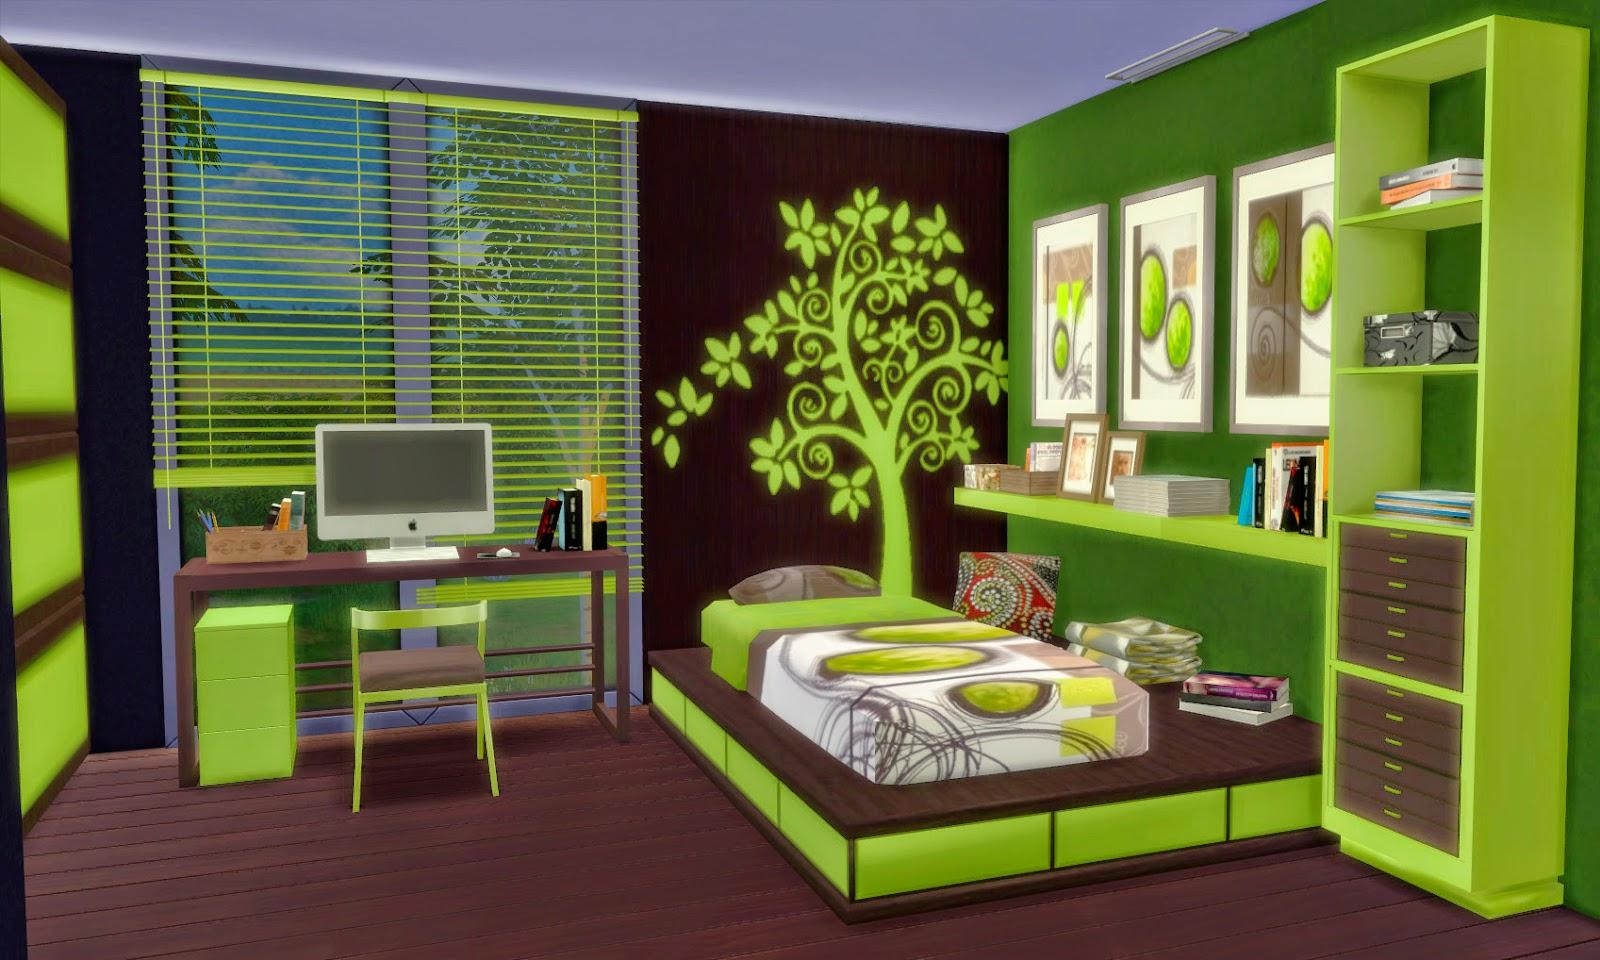 Bedroom bilbao sims 4 custom content for Dormitorio sims 4